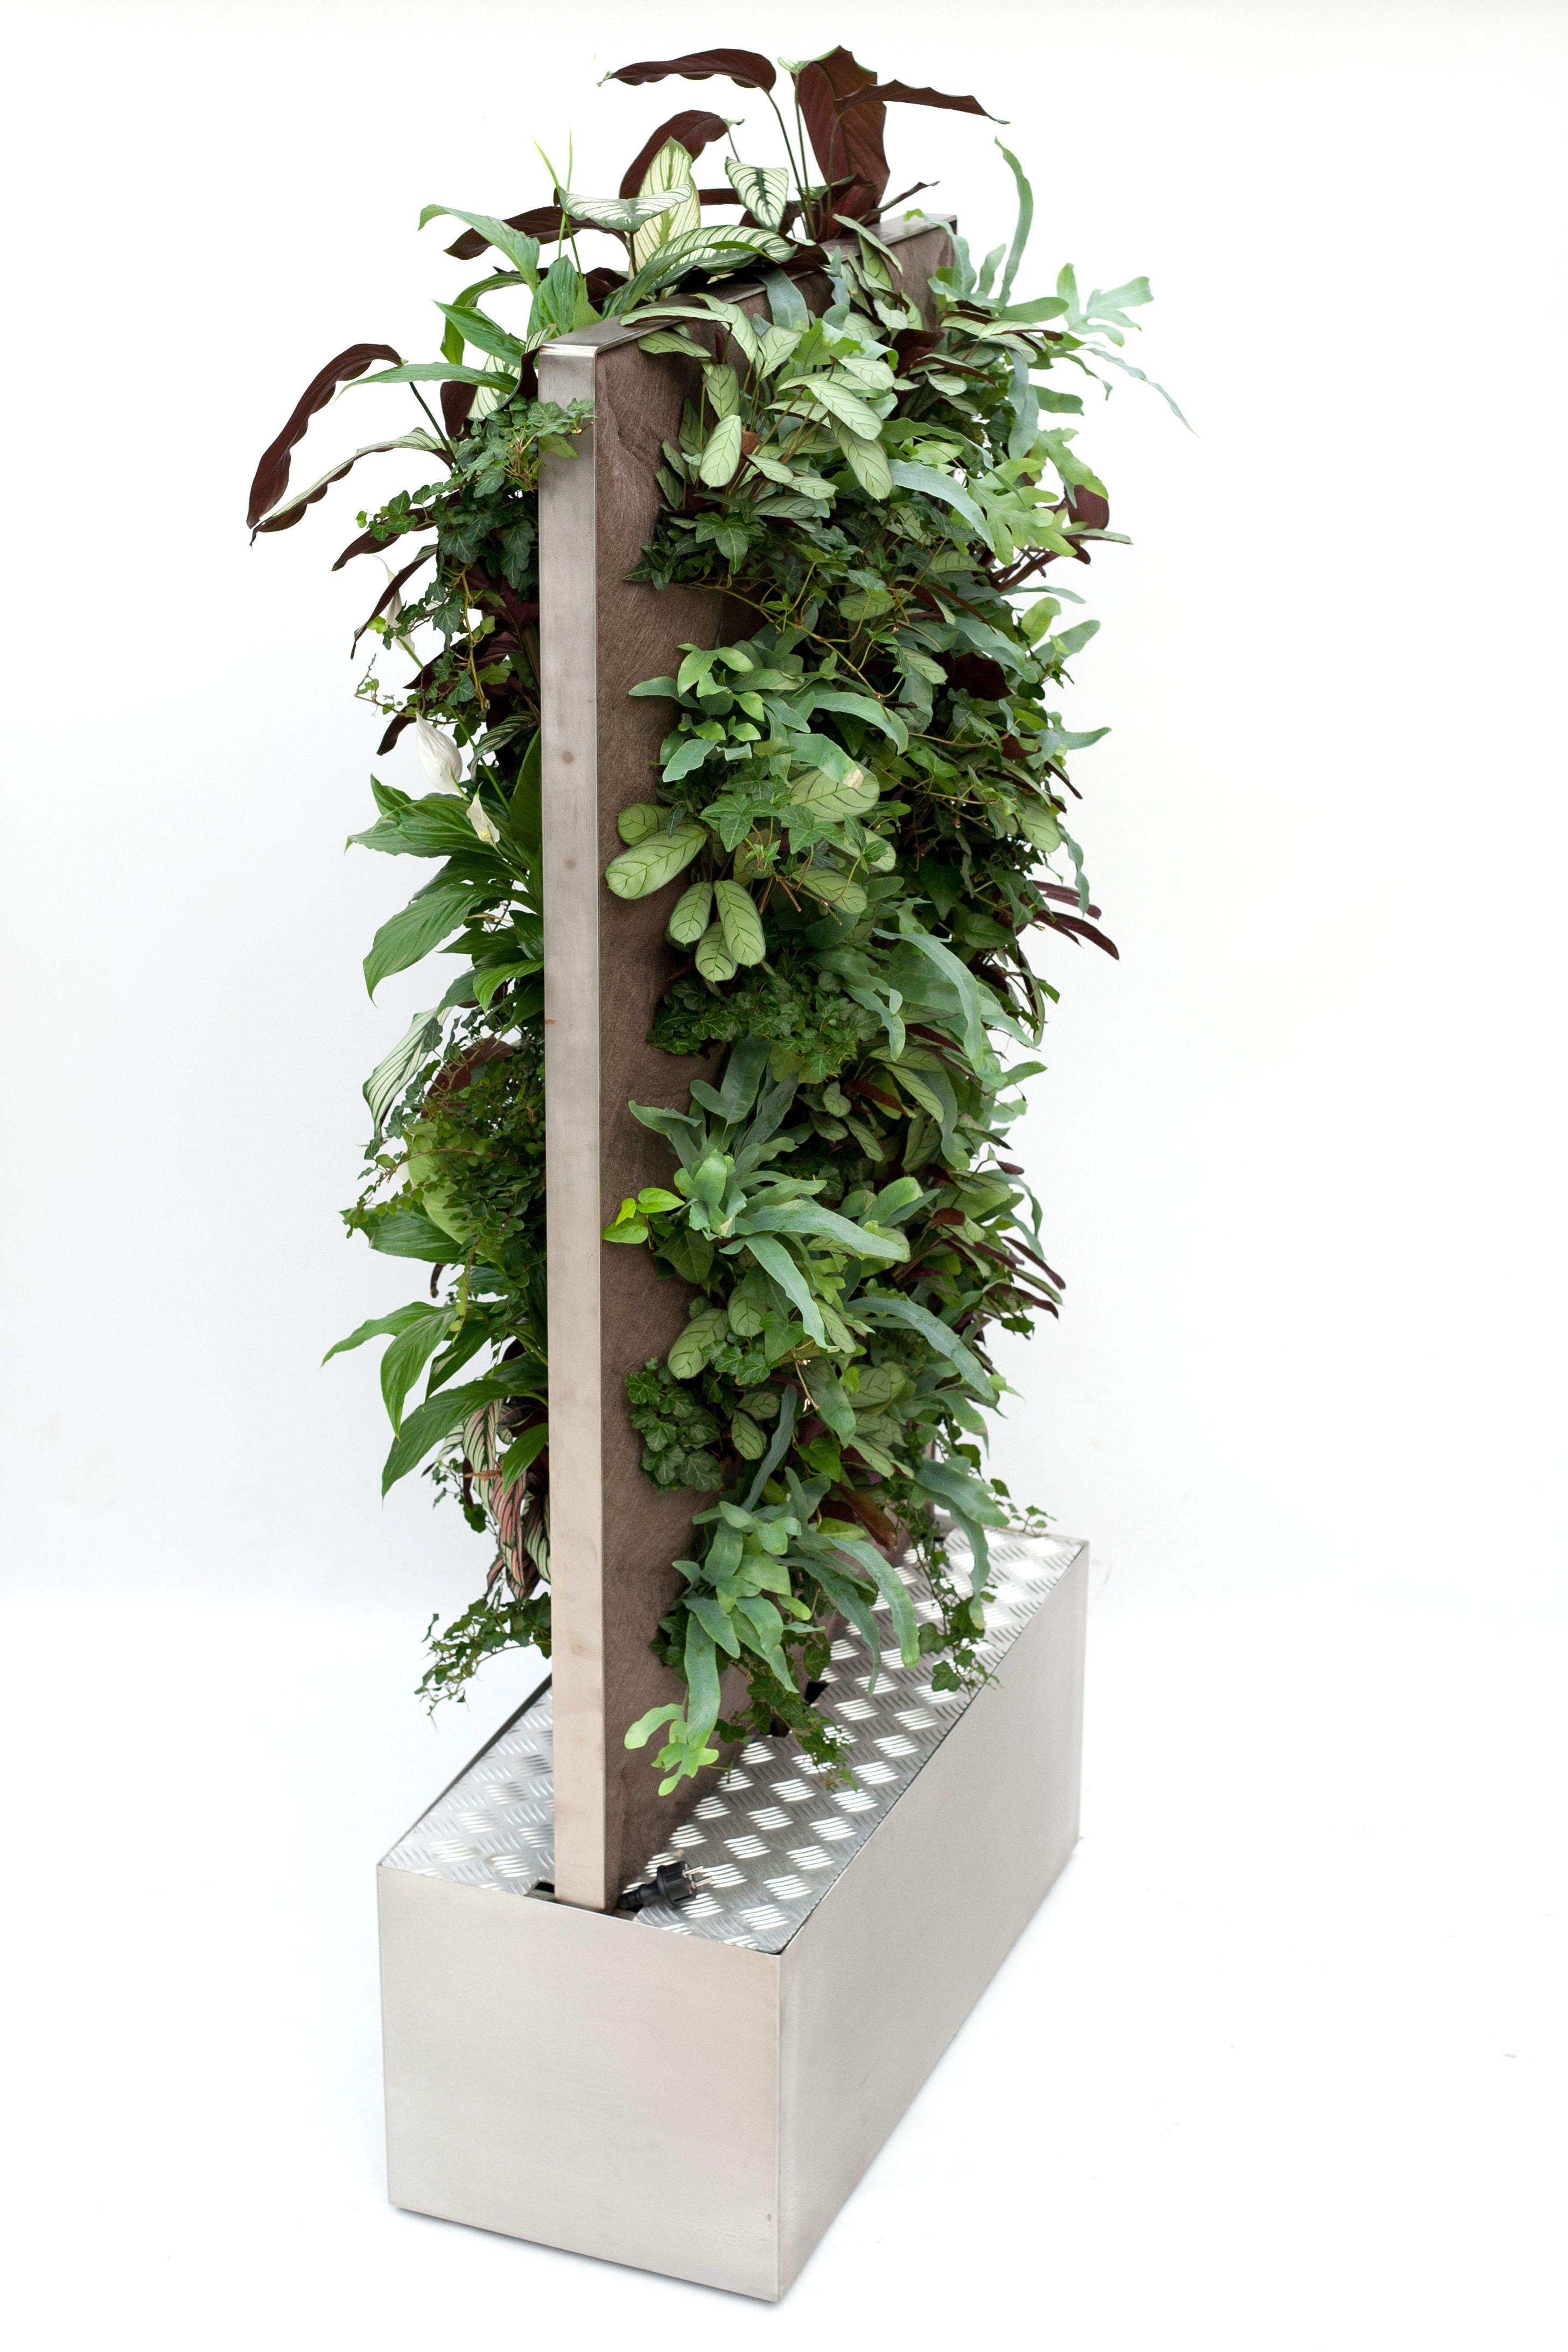 Simple vertiplant mobile verticaal tuinieren binnen for Verticale tuin systeem